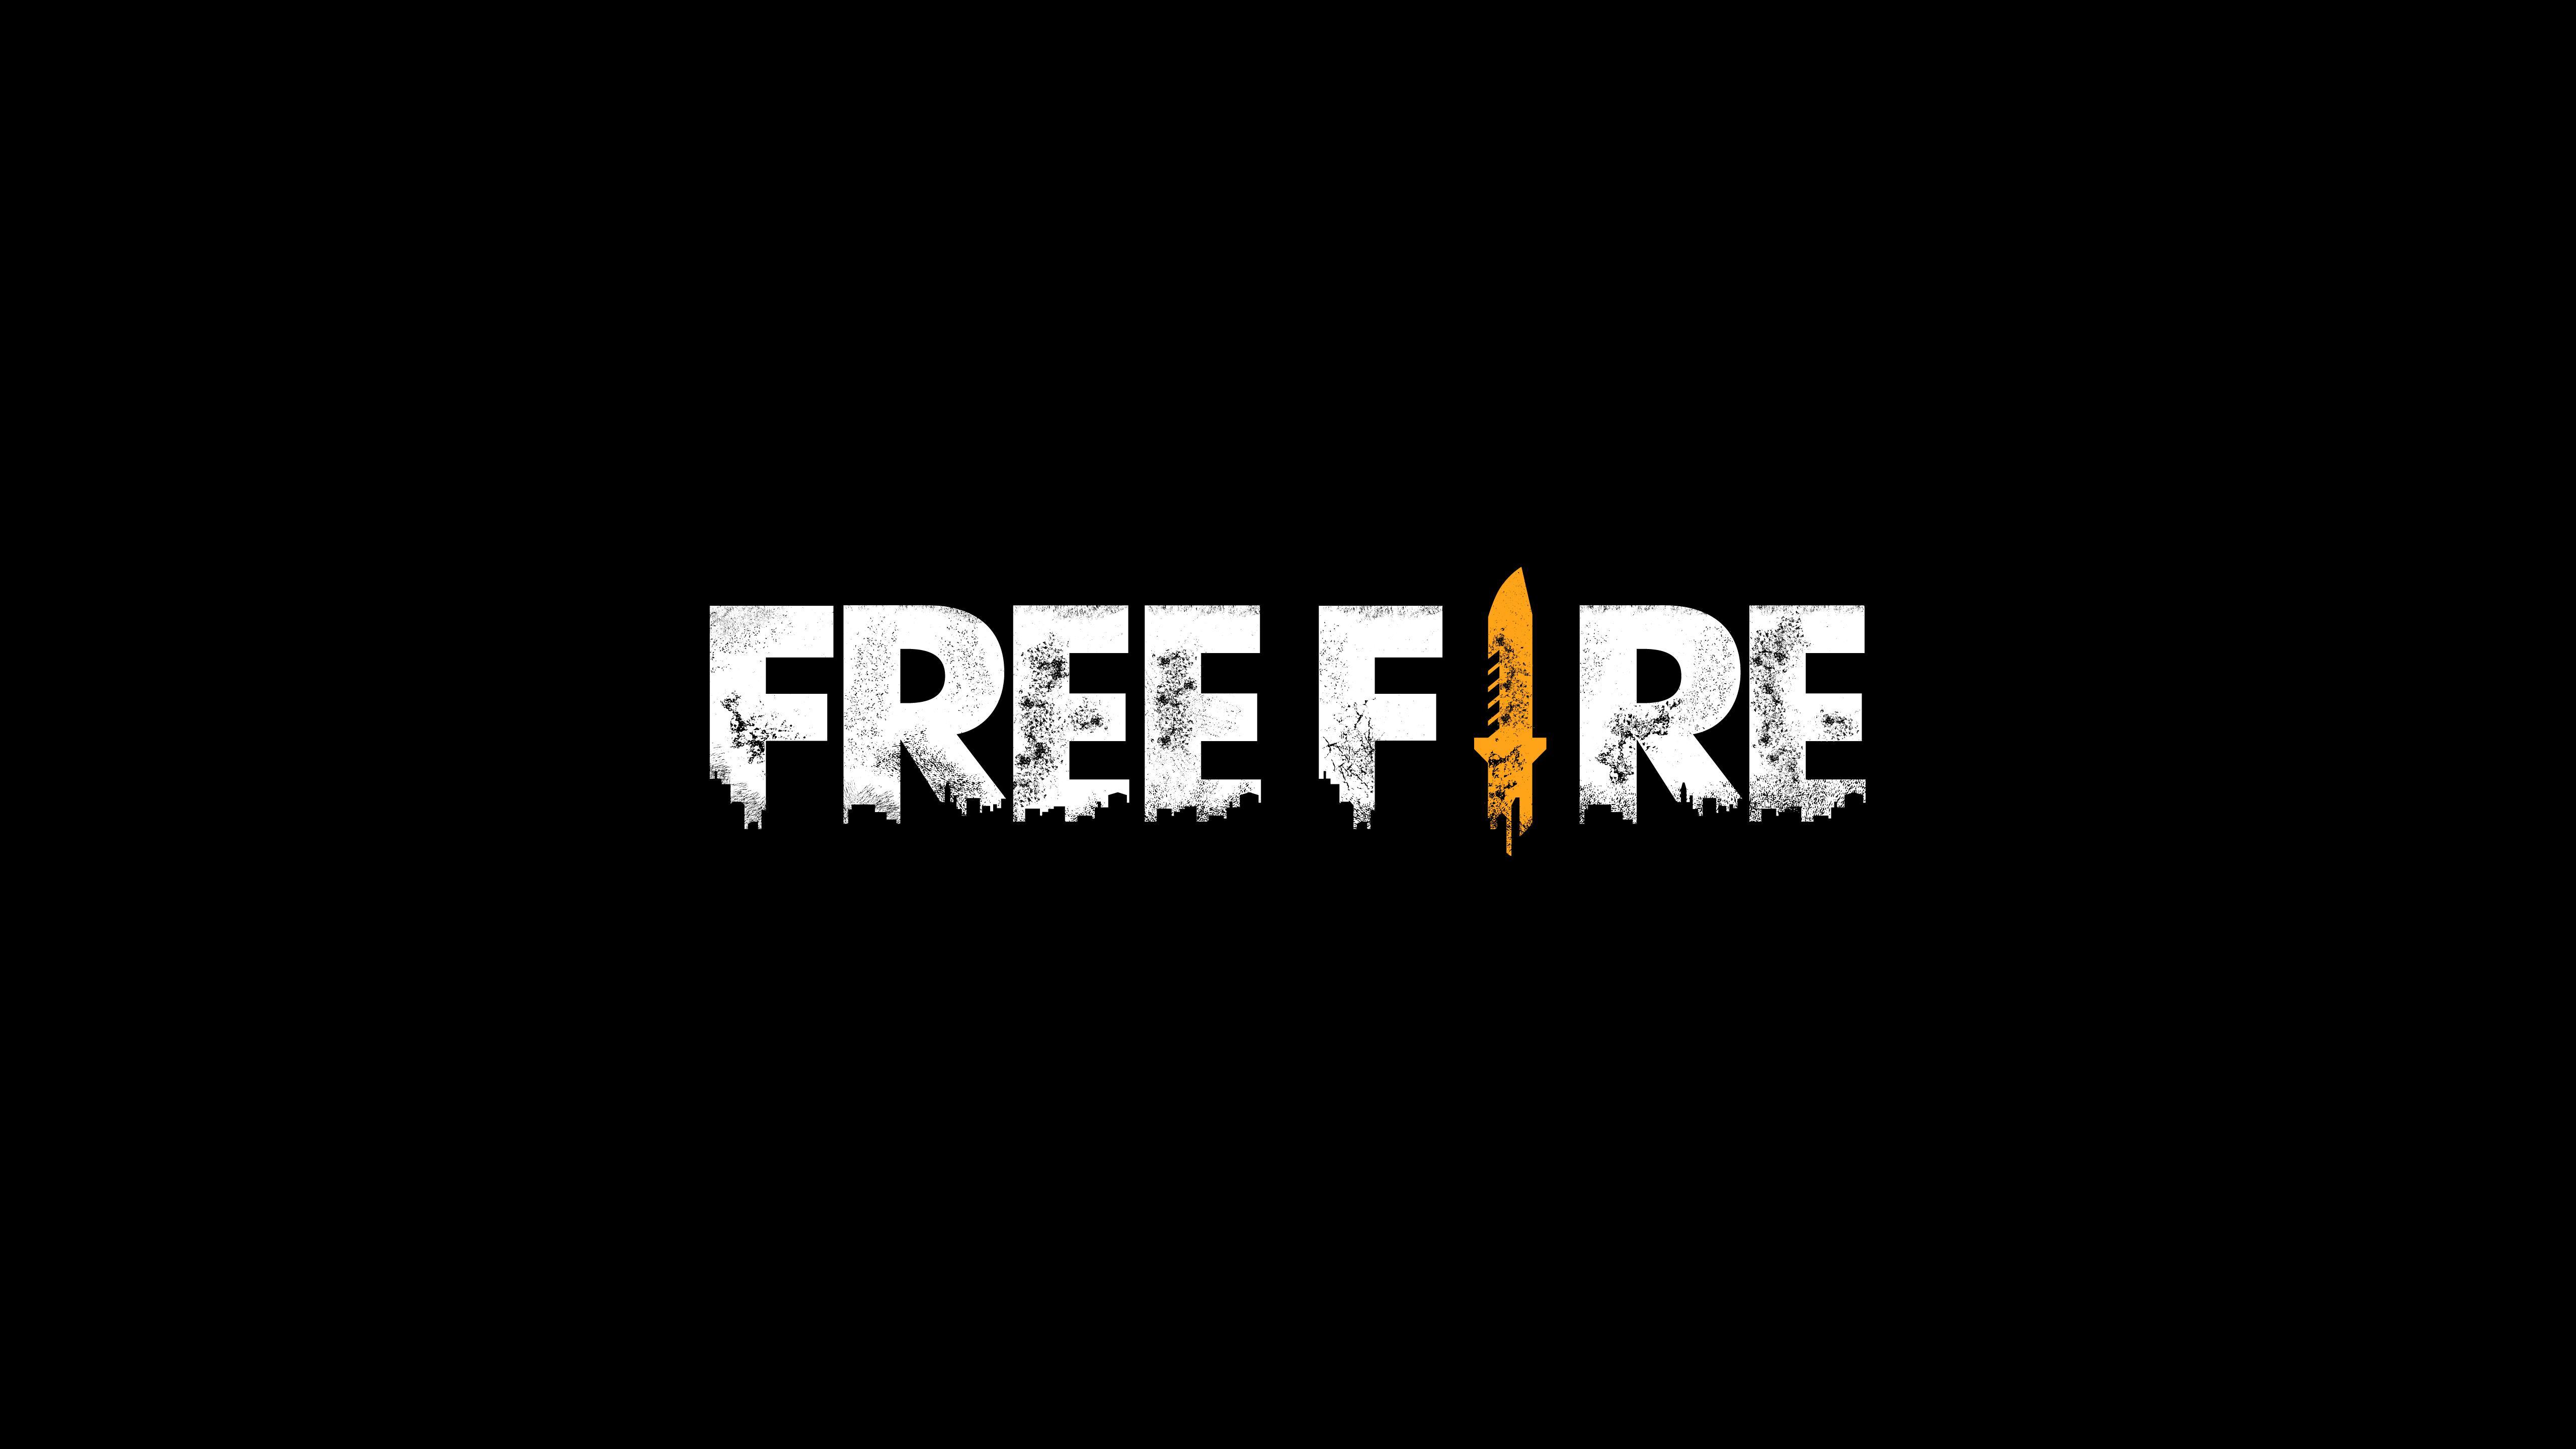 Garena Free Fire Logo Wallpapers Wallpaper Cave